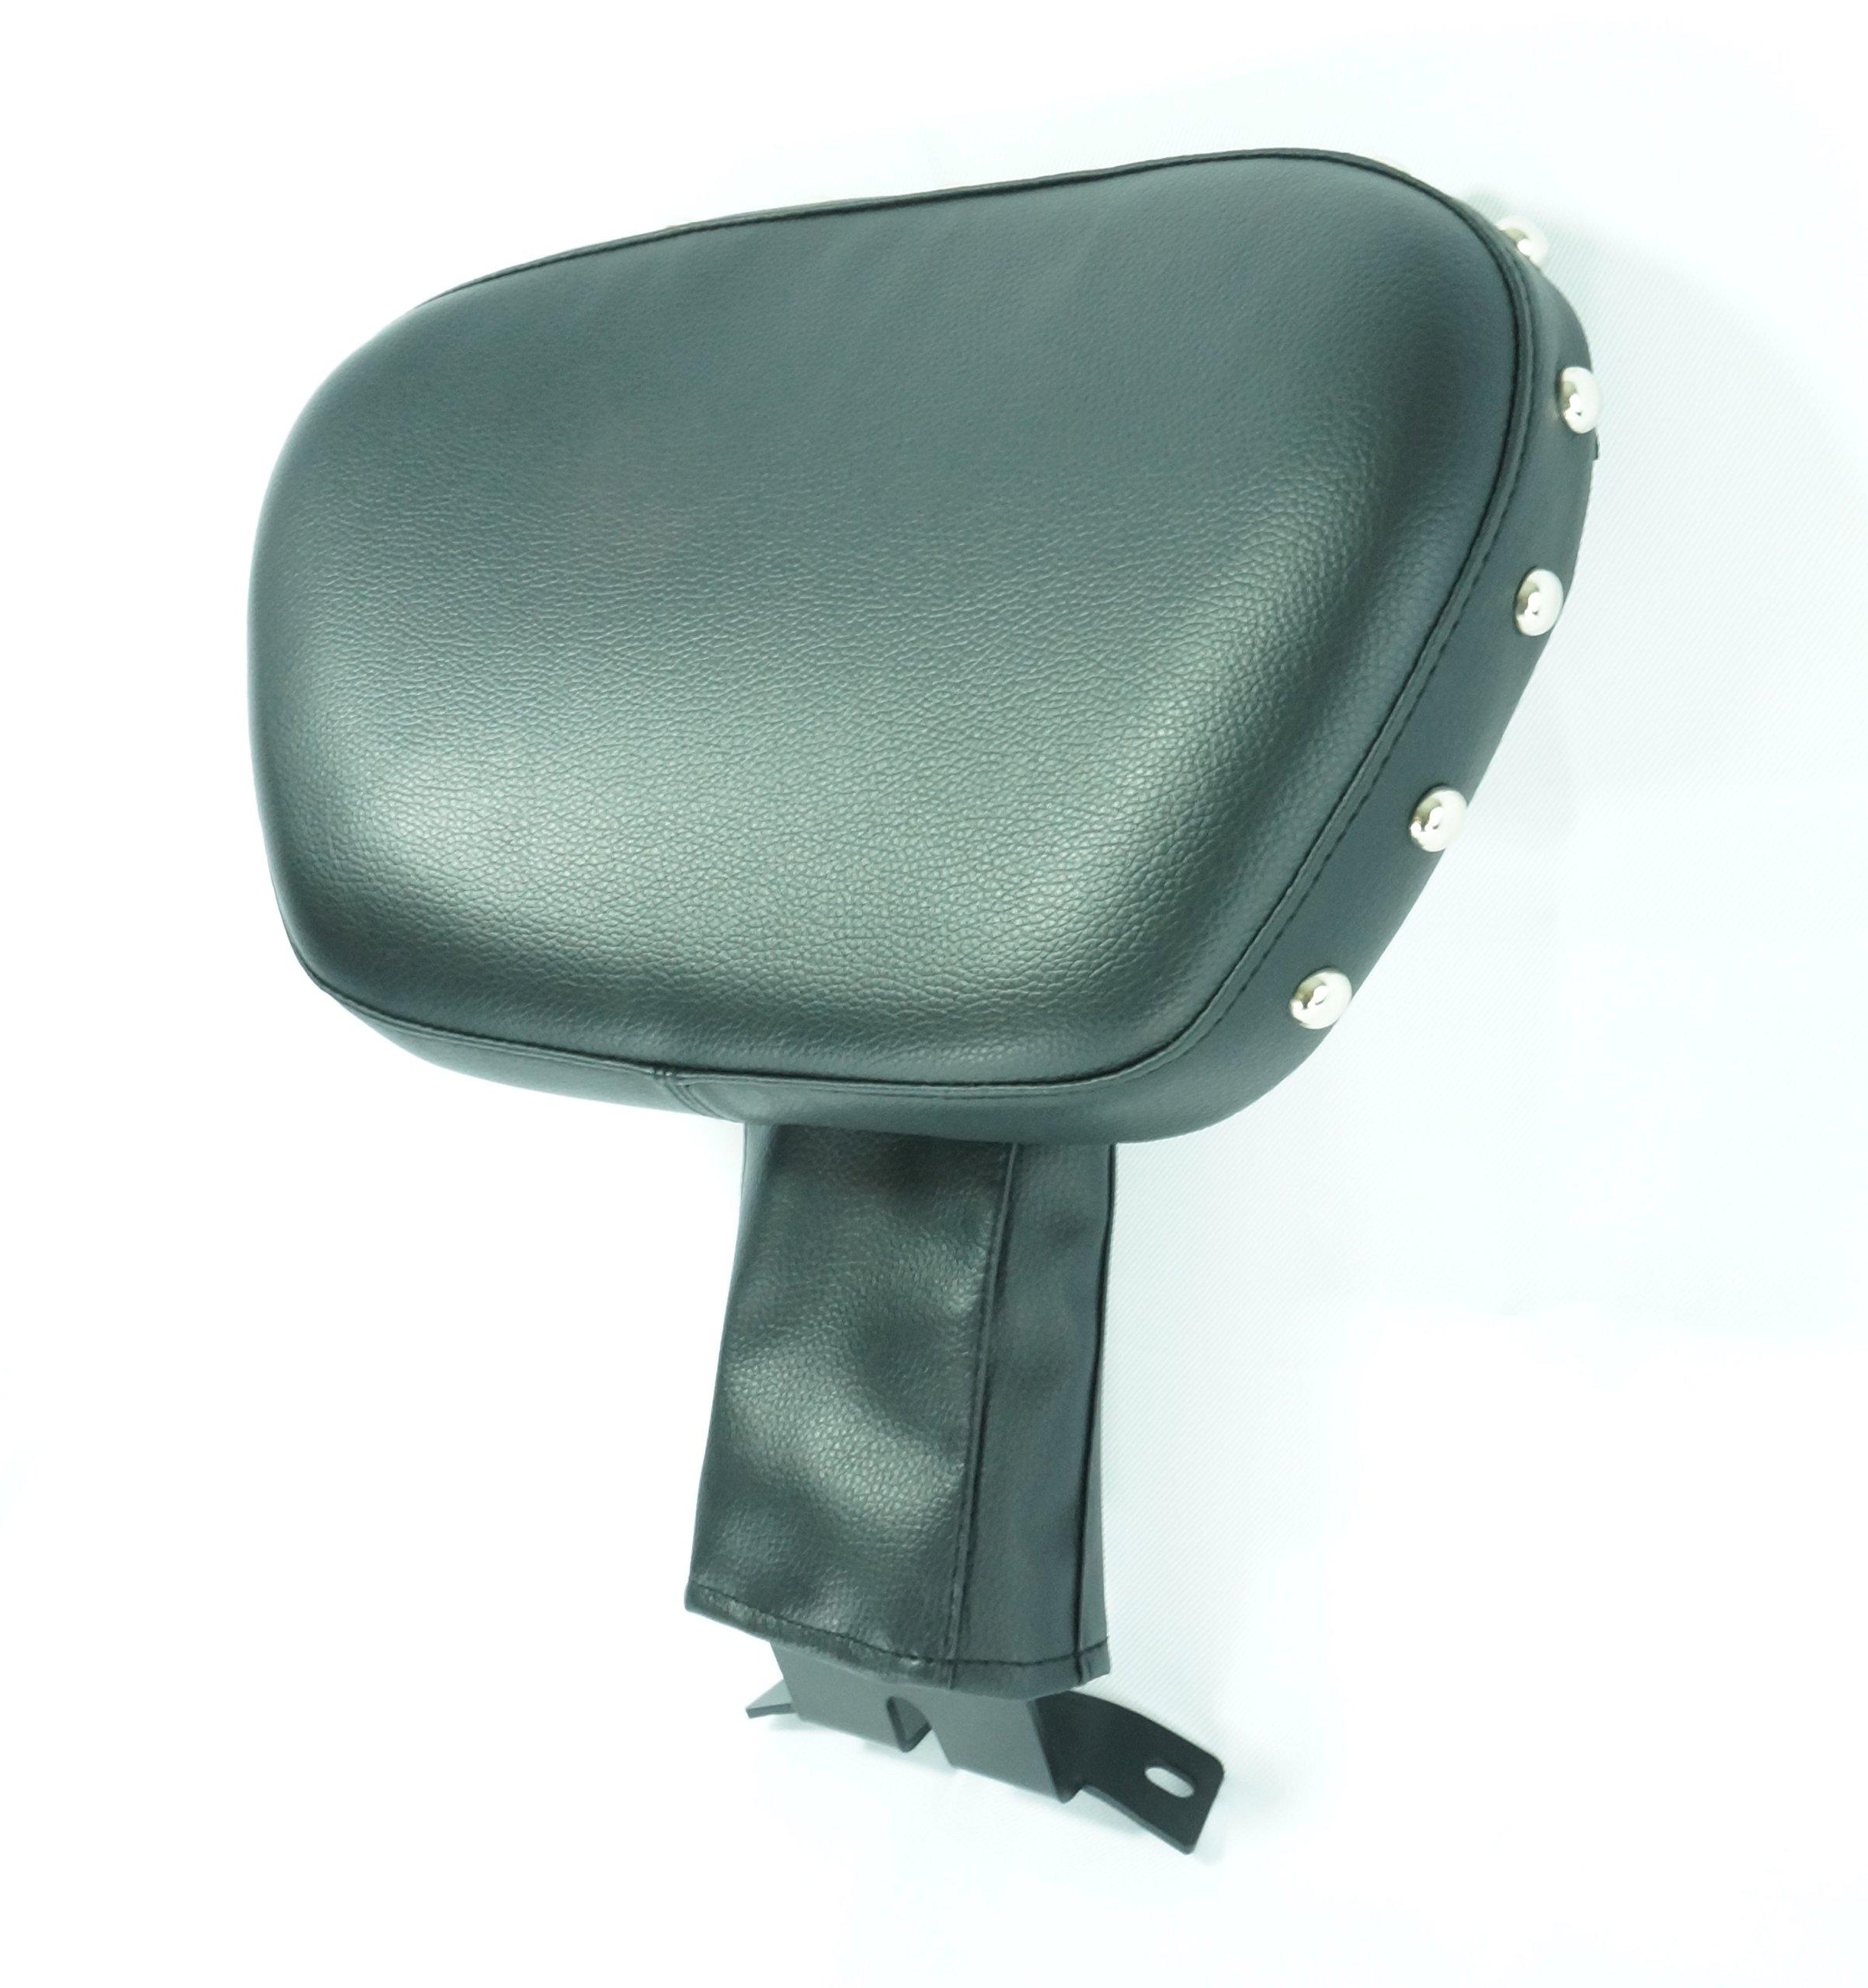 Harley HD Fatboy Heritage Softail Adjustable Rider Driver Stud Backrest(2007-2014)